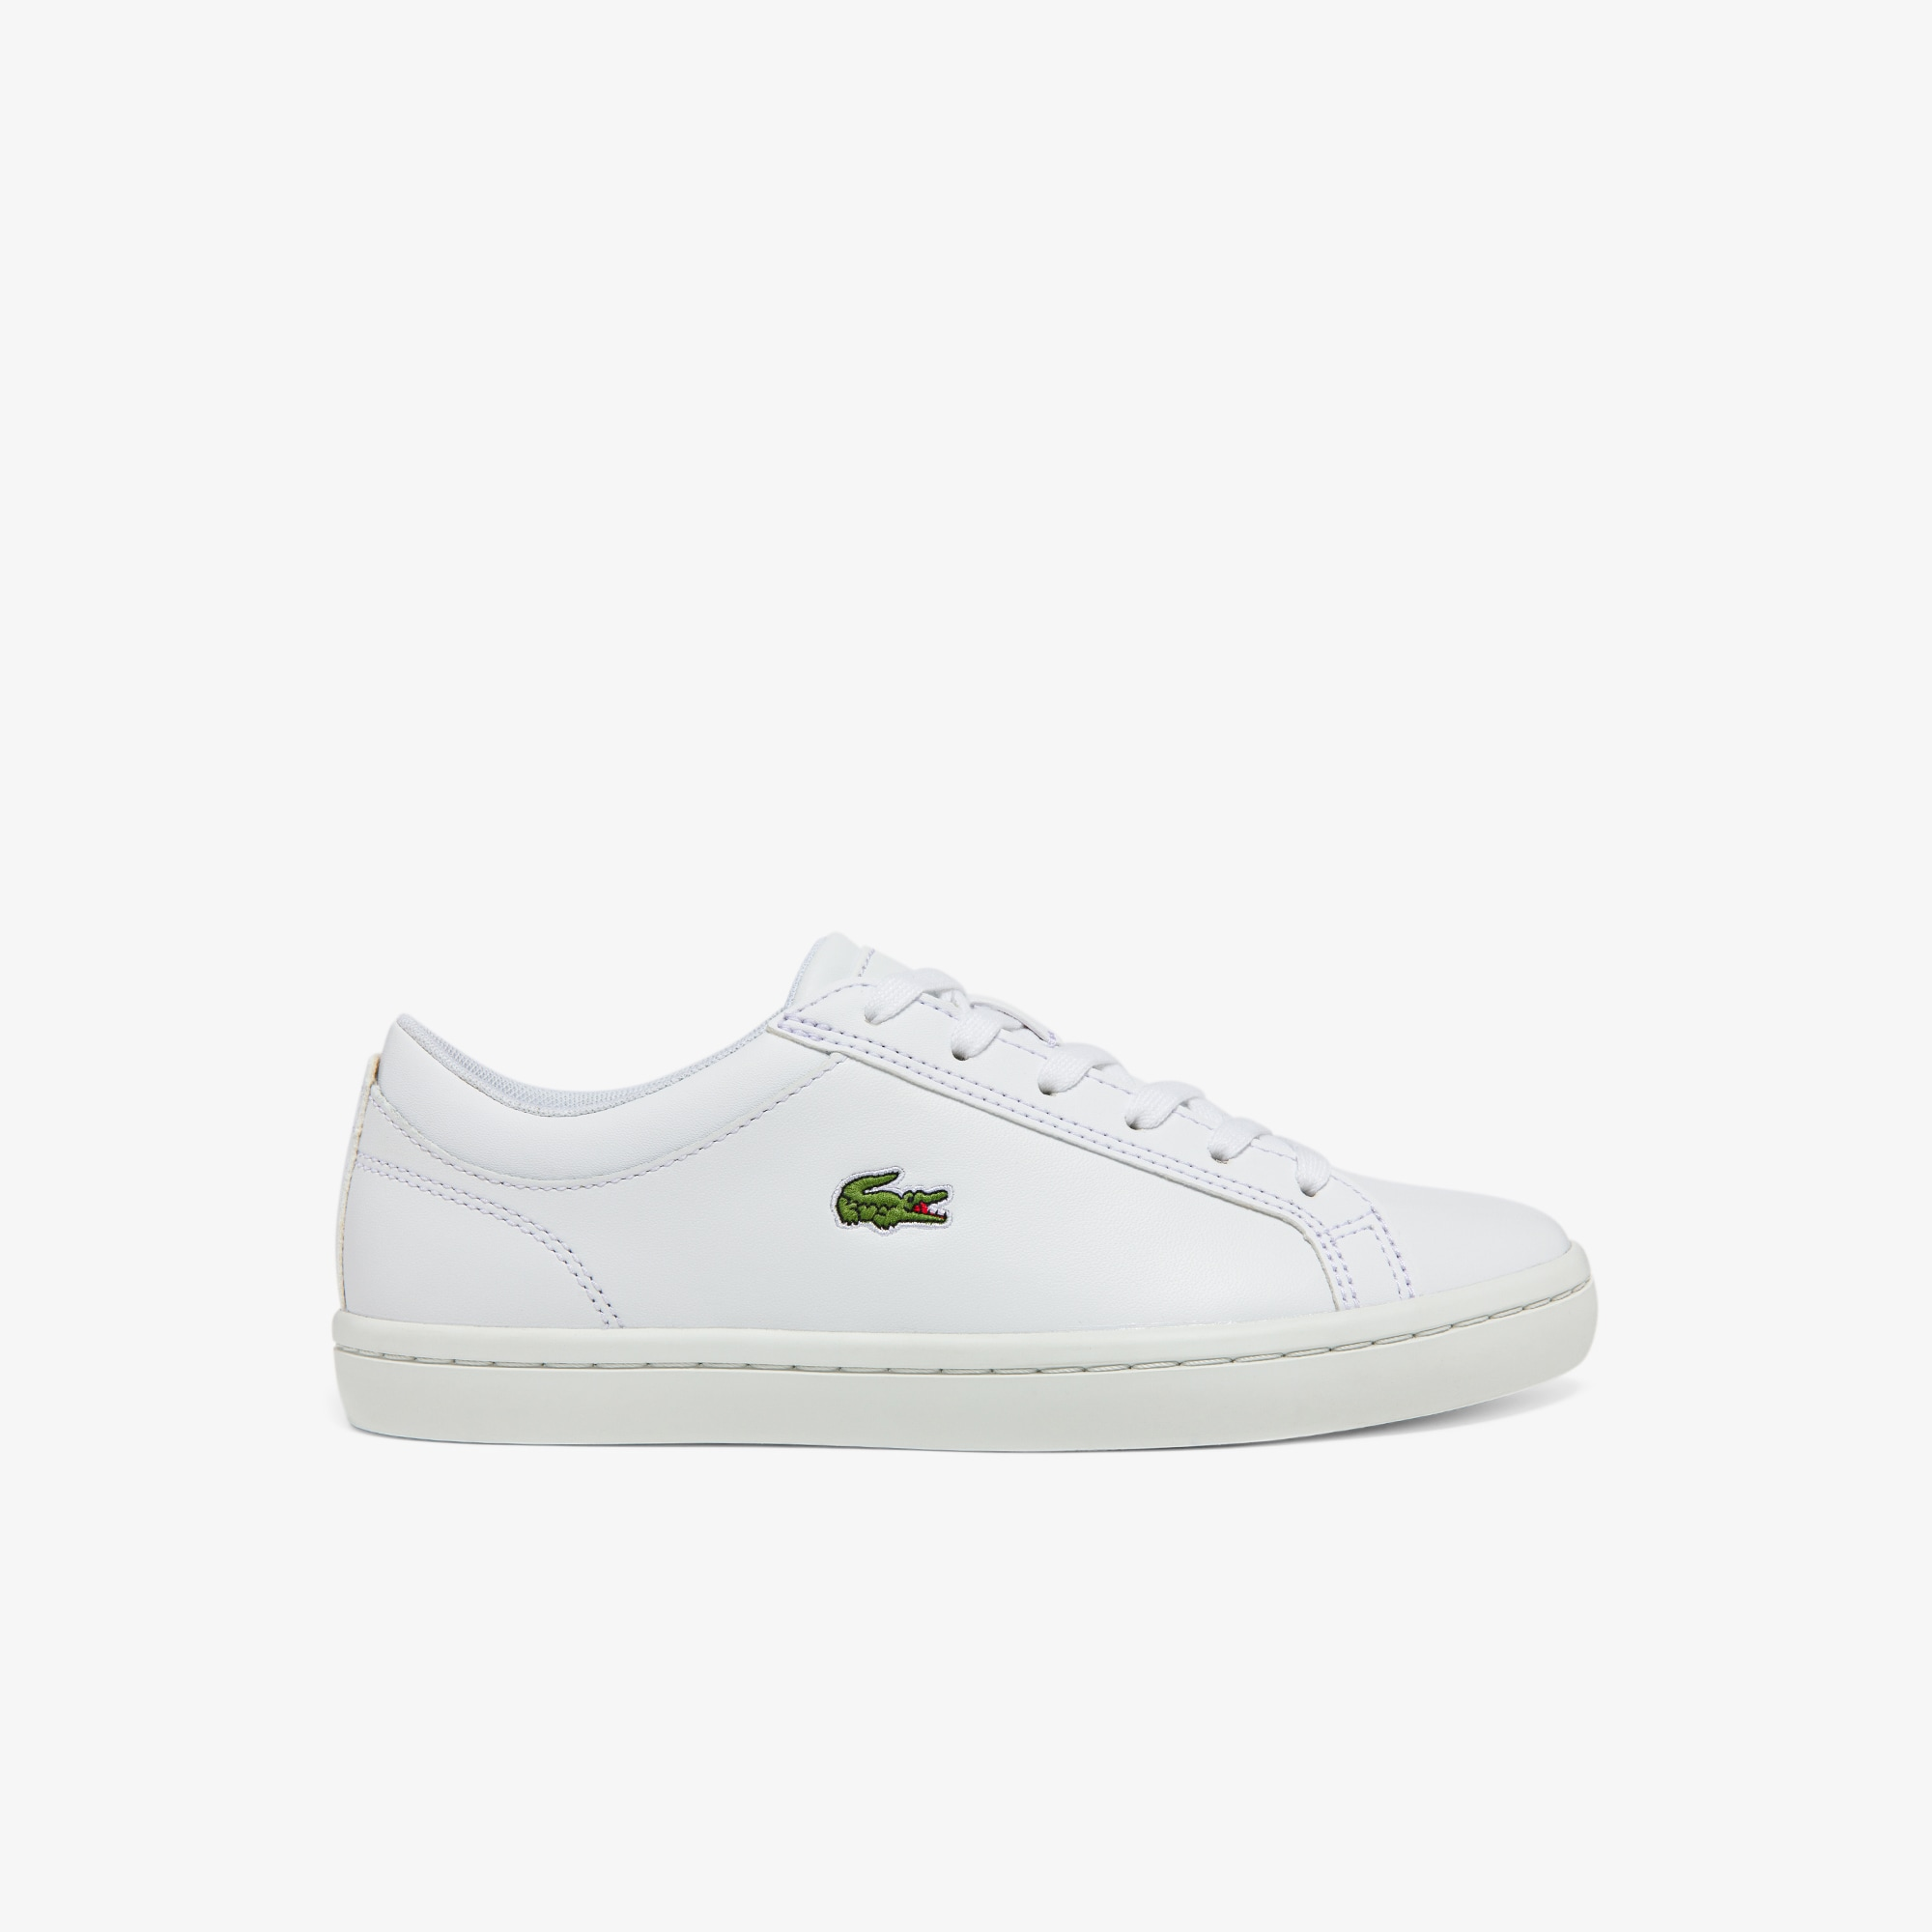 Sneakers Straightset en cuir et synthétique